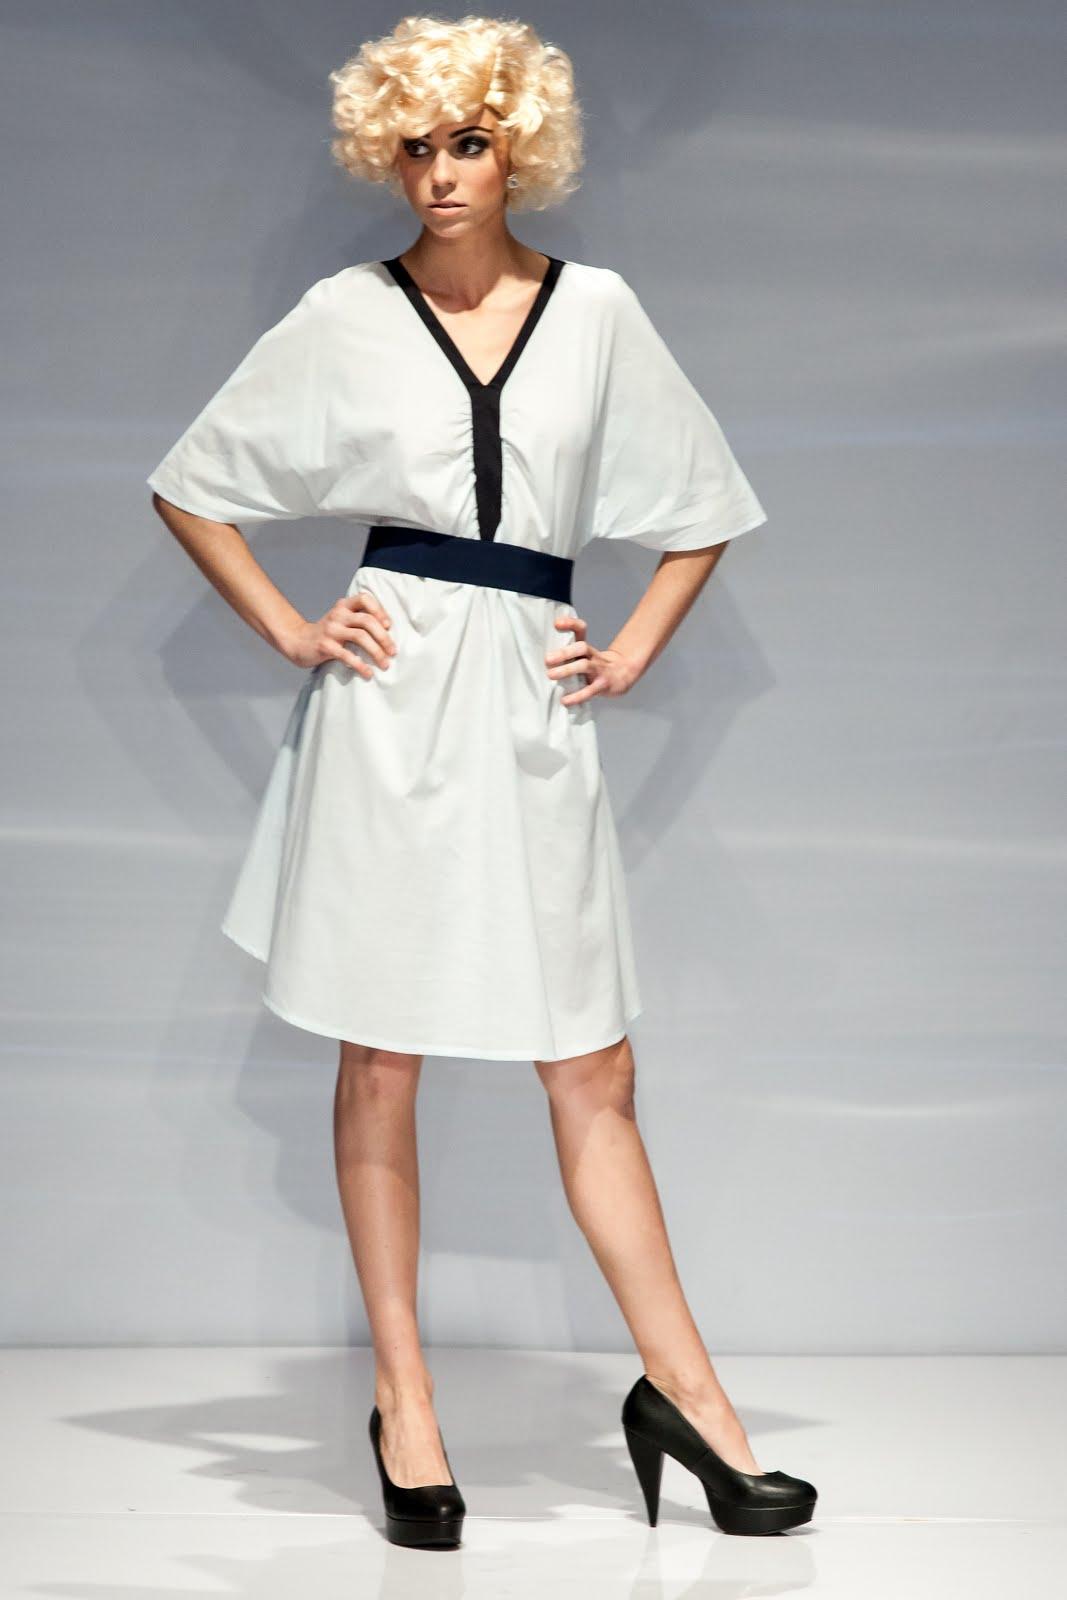 G.KIM_-_Boston_Fashion_Week_2012.jpg